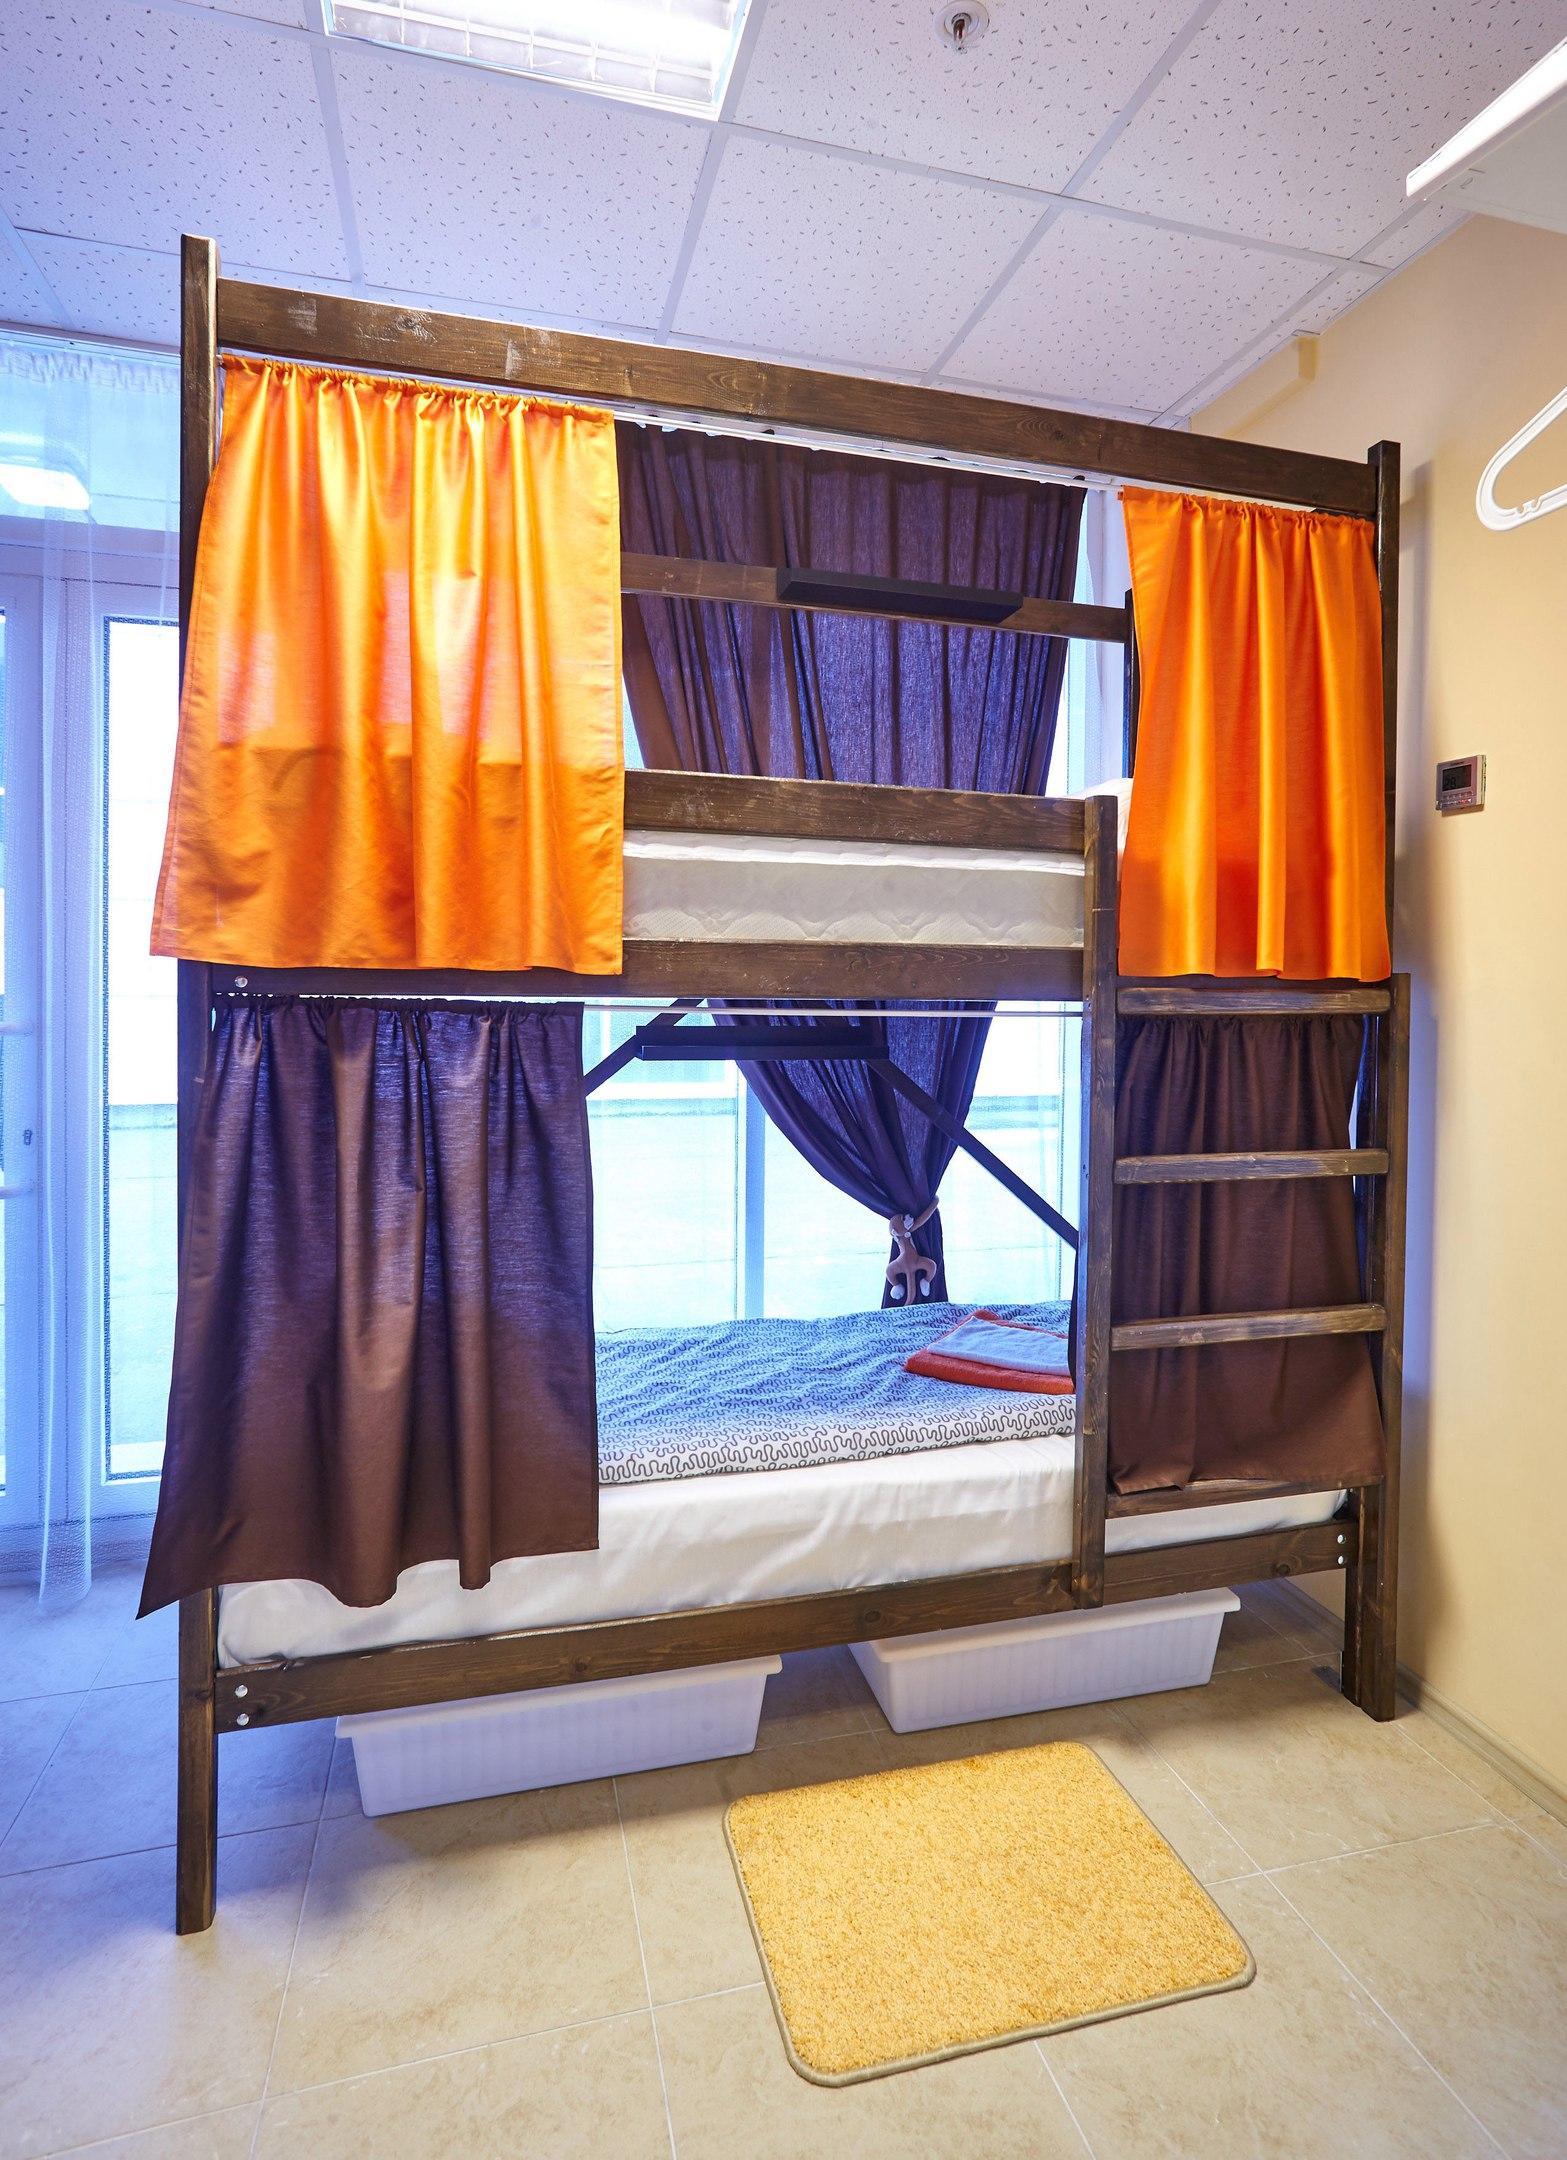 Хостел на Навагинской - image 9QPghmLU8Xg on http://bizneskvartal.ru